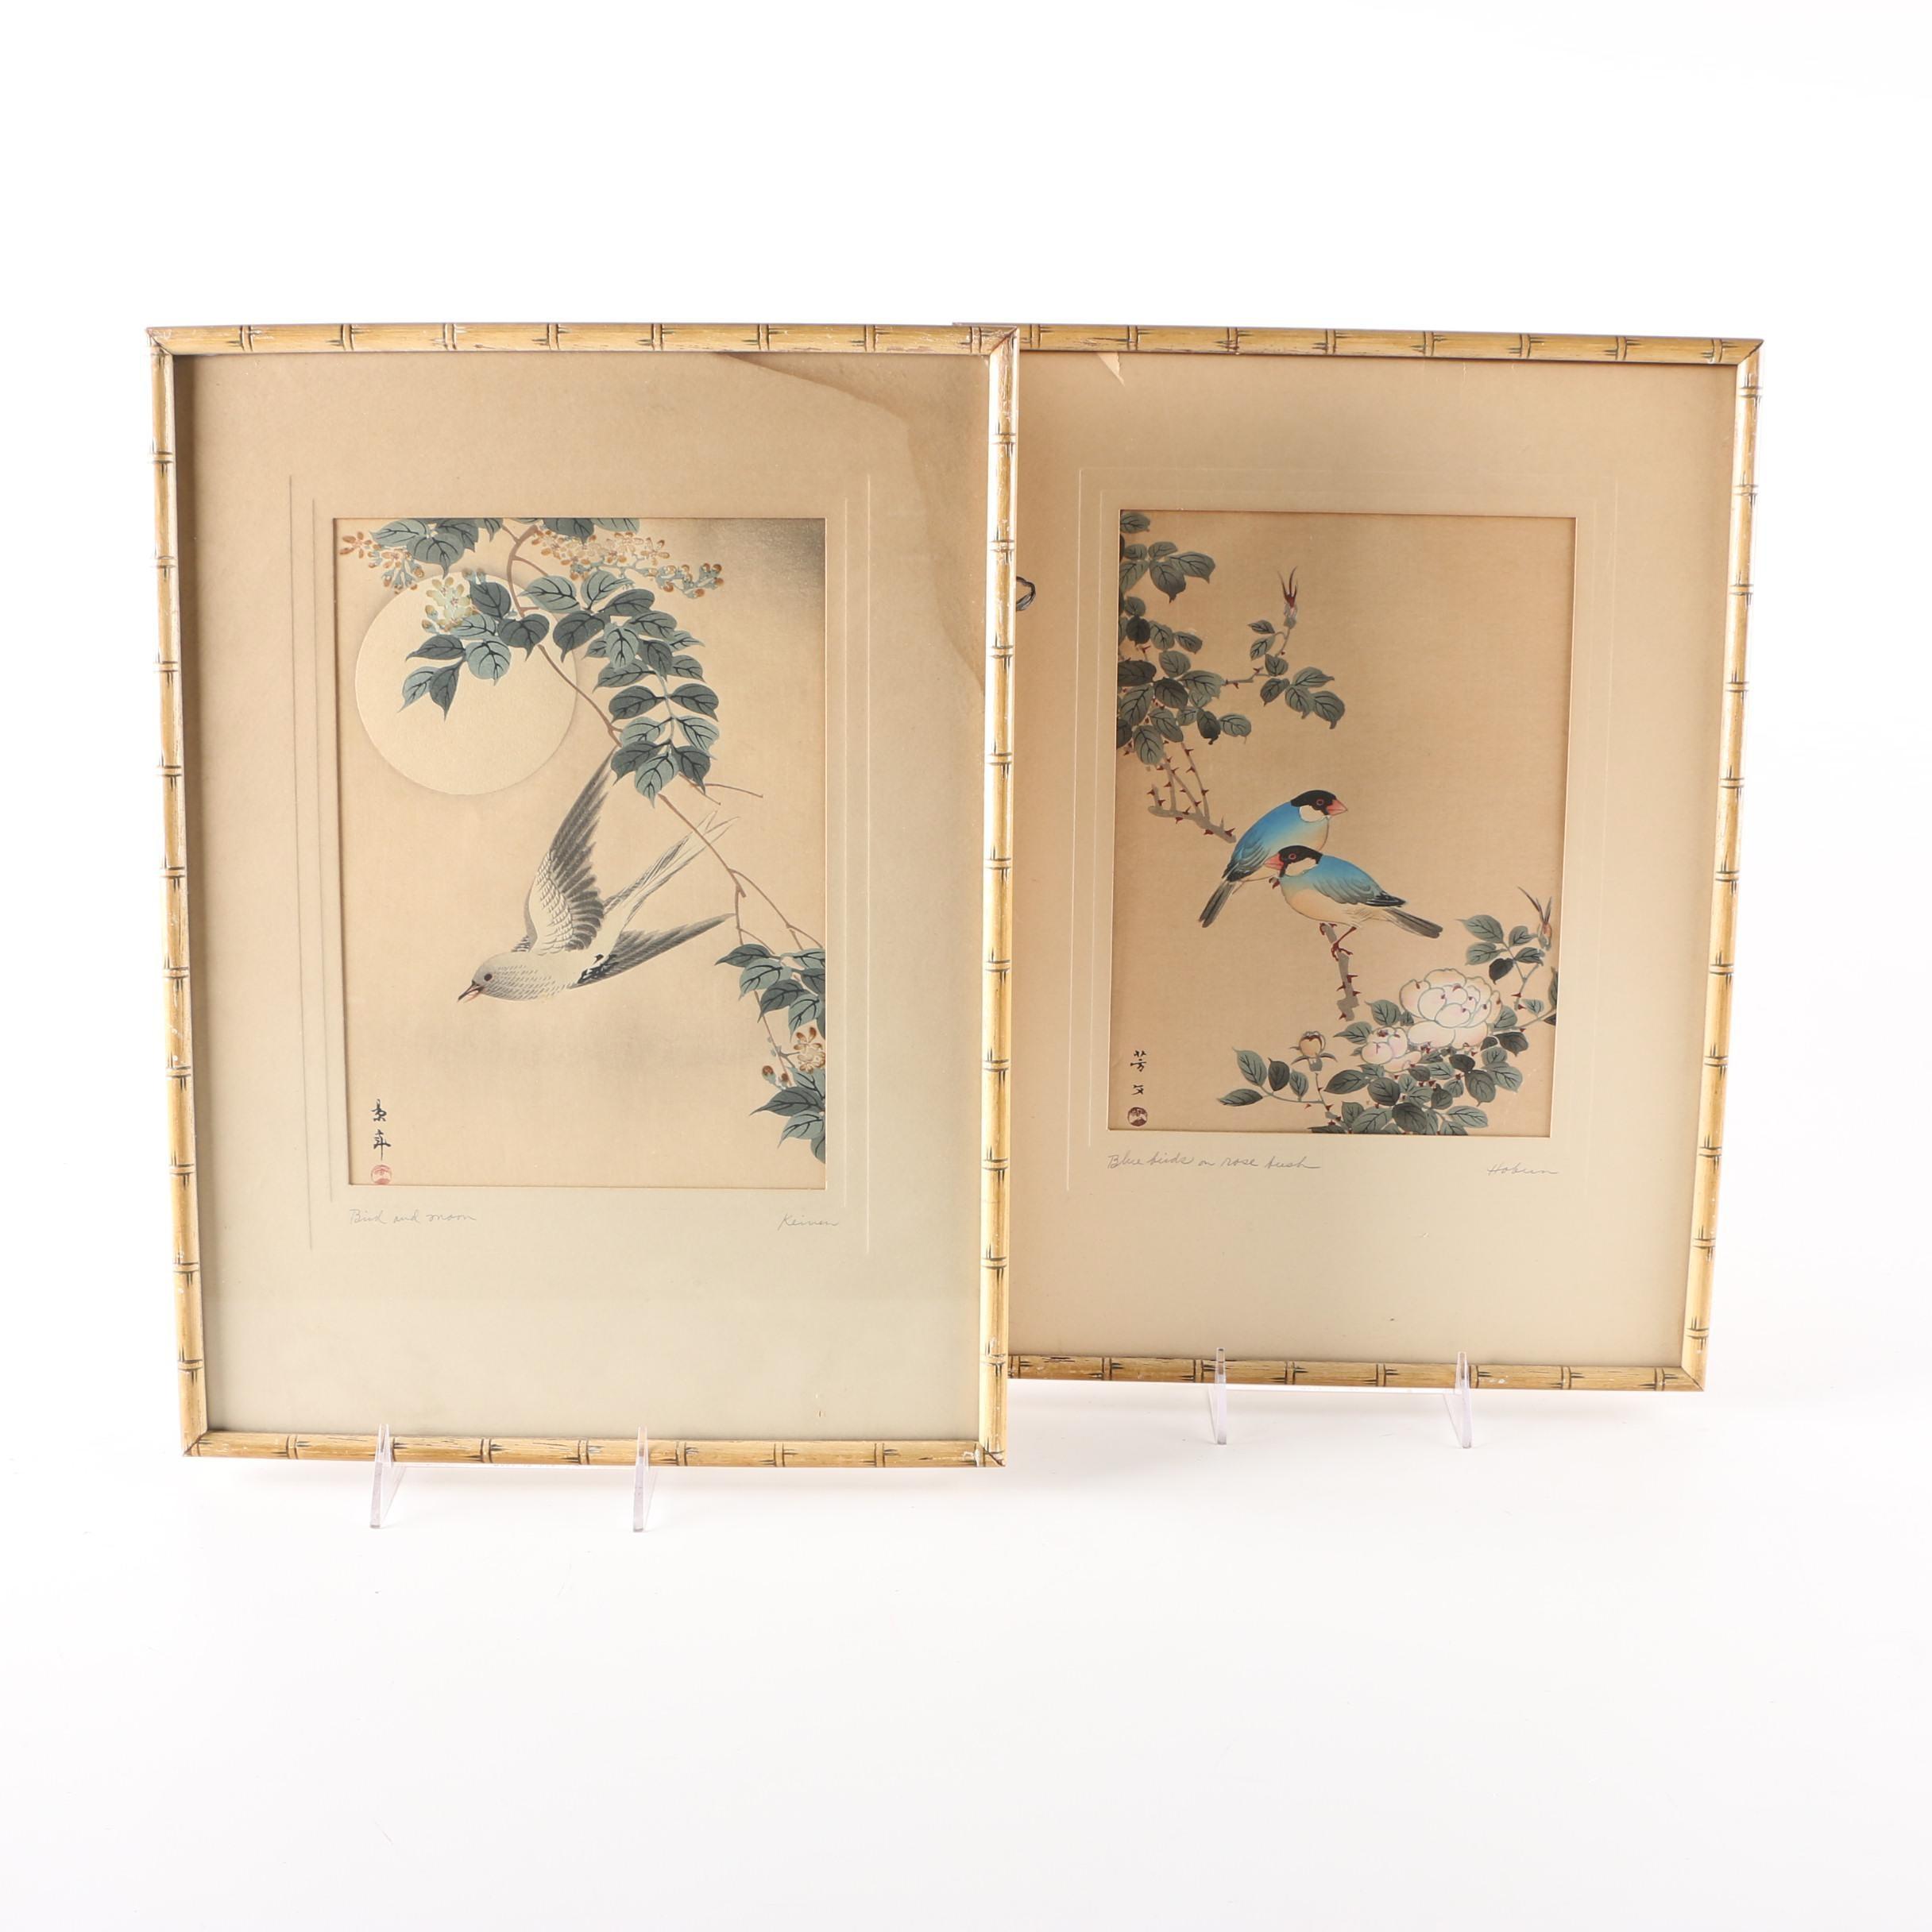 Japanese Woodblock Prints by Kikuchi Hōbun and Imao Keinen